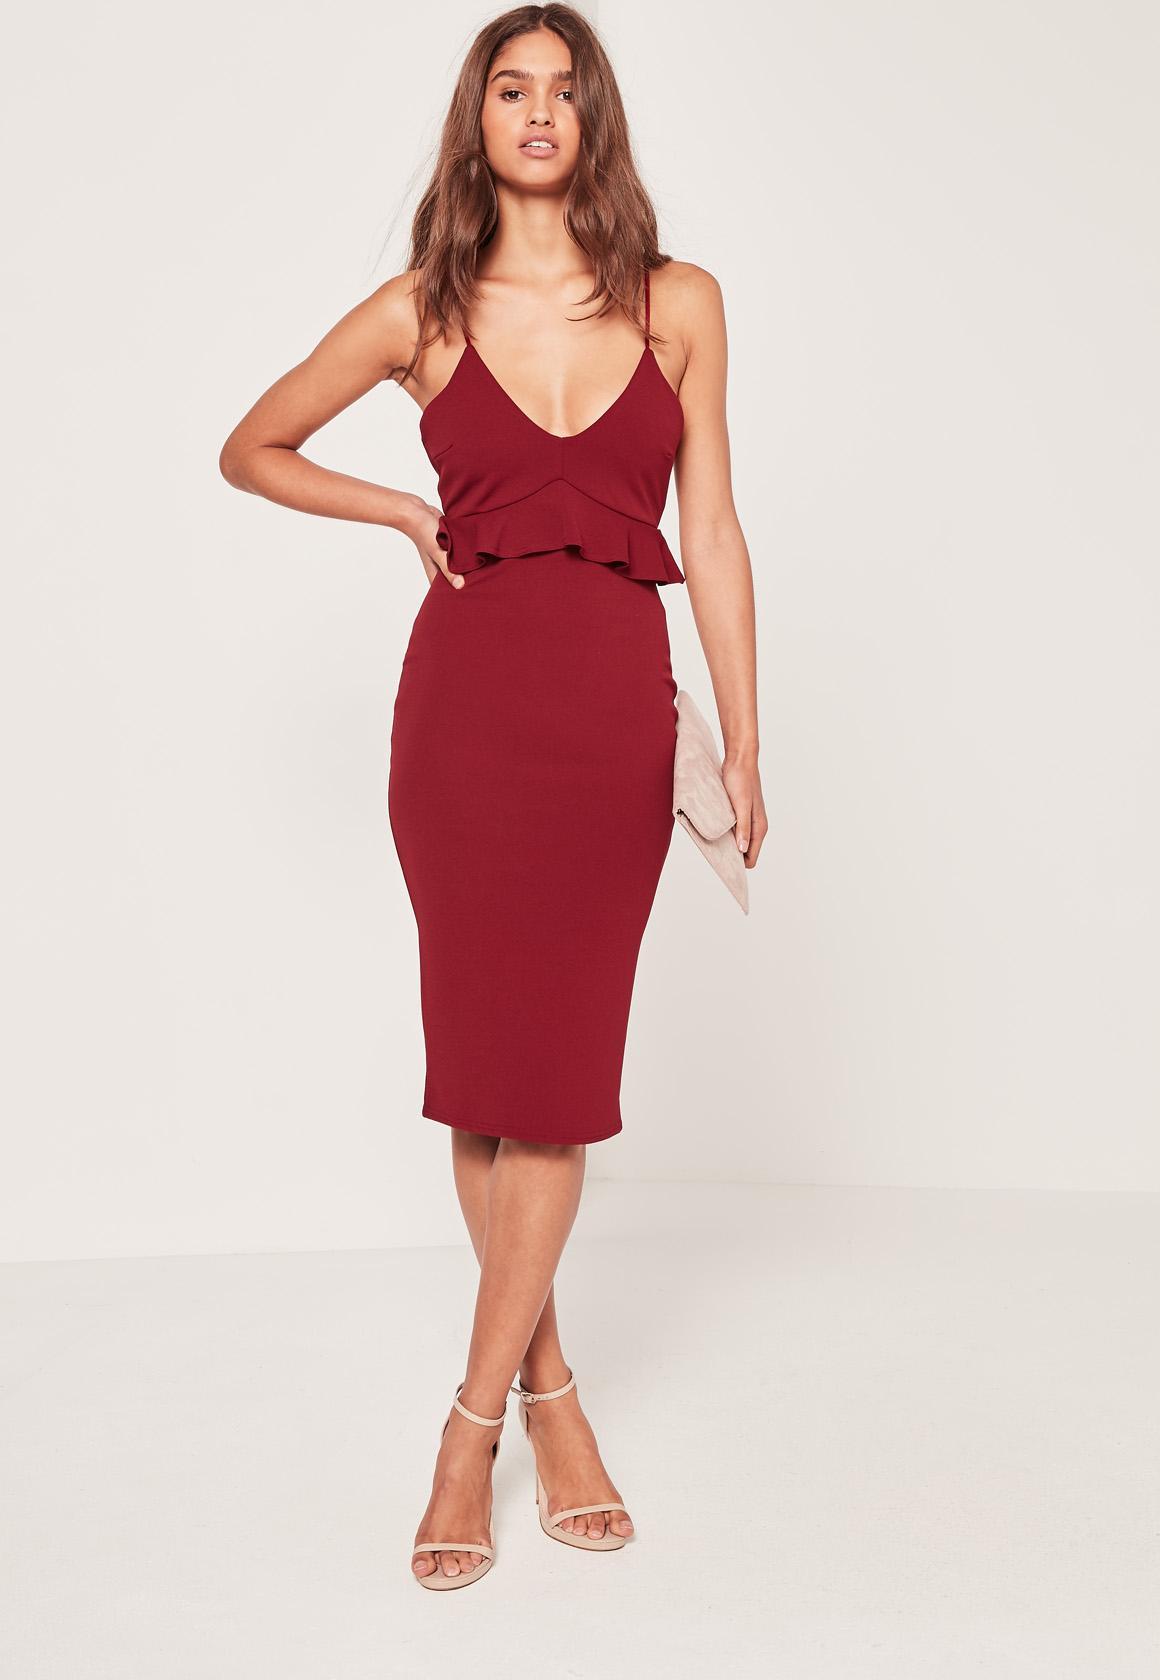 Strappy Frill Bodycon Dress Burgundy